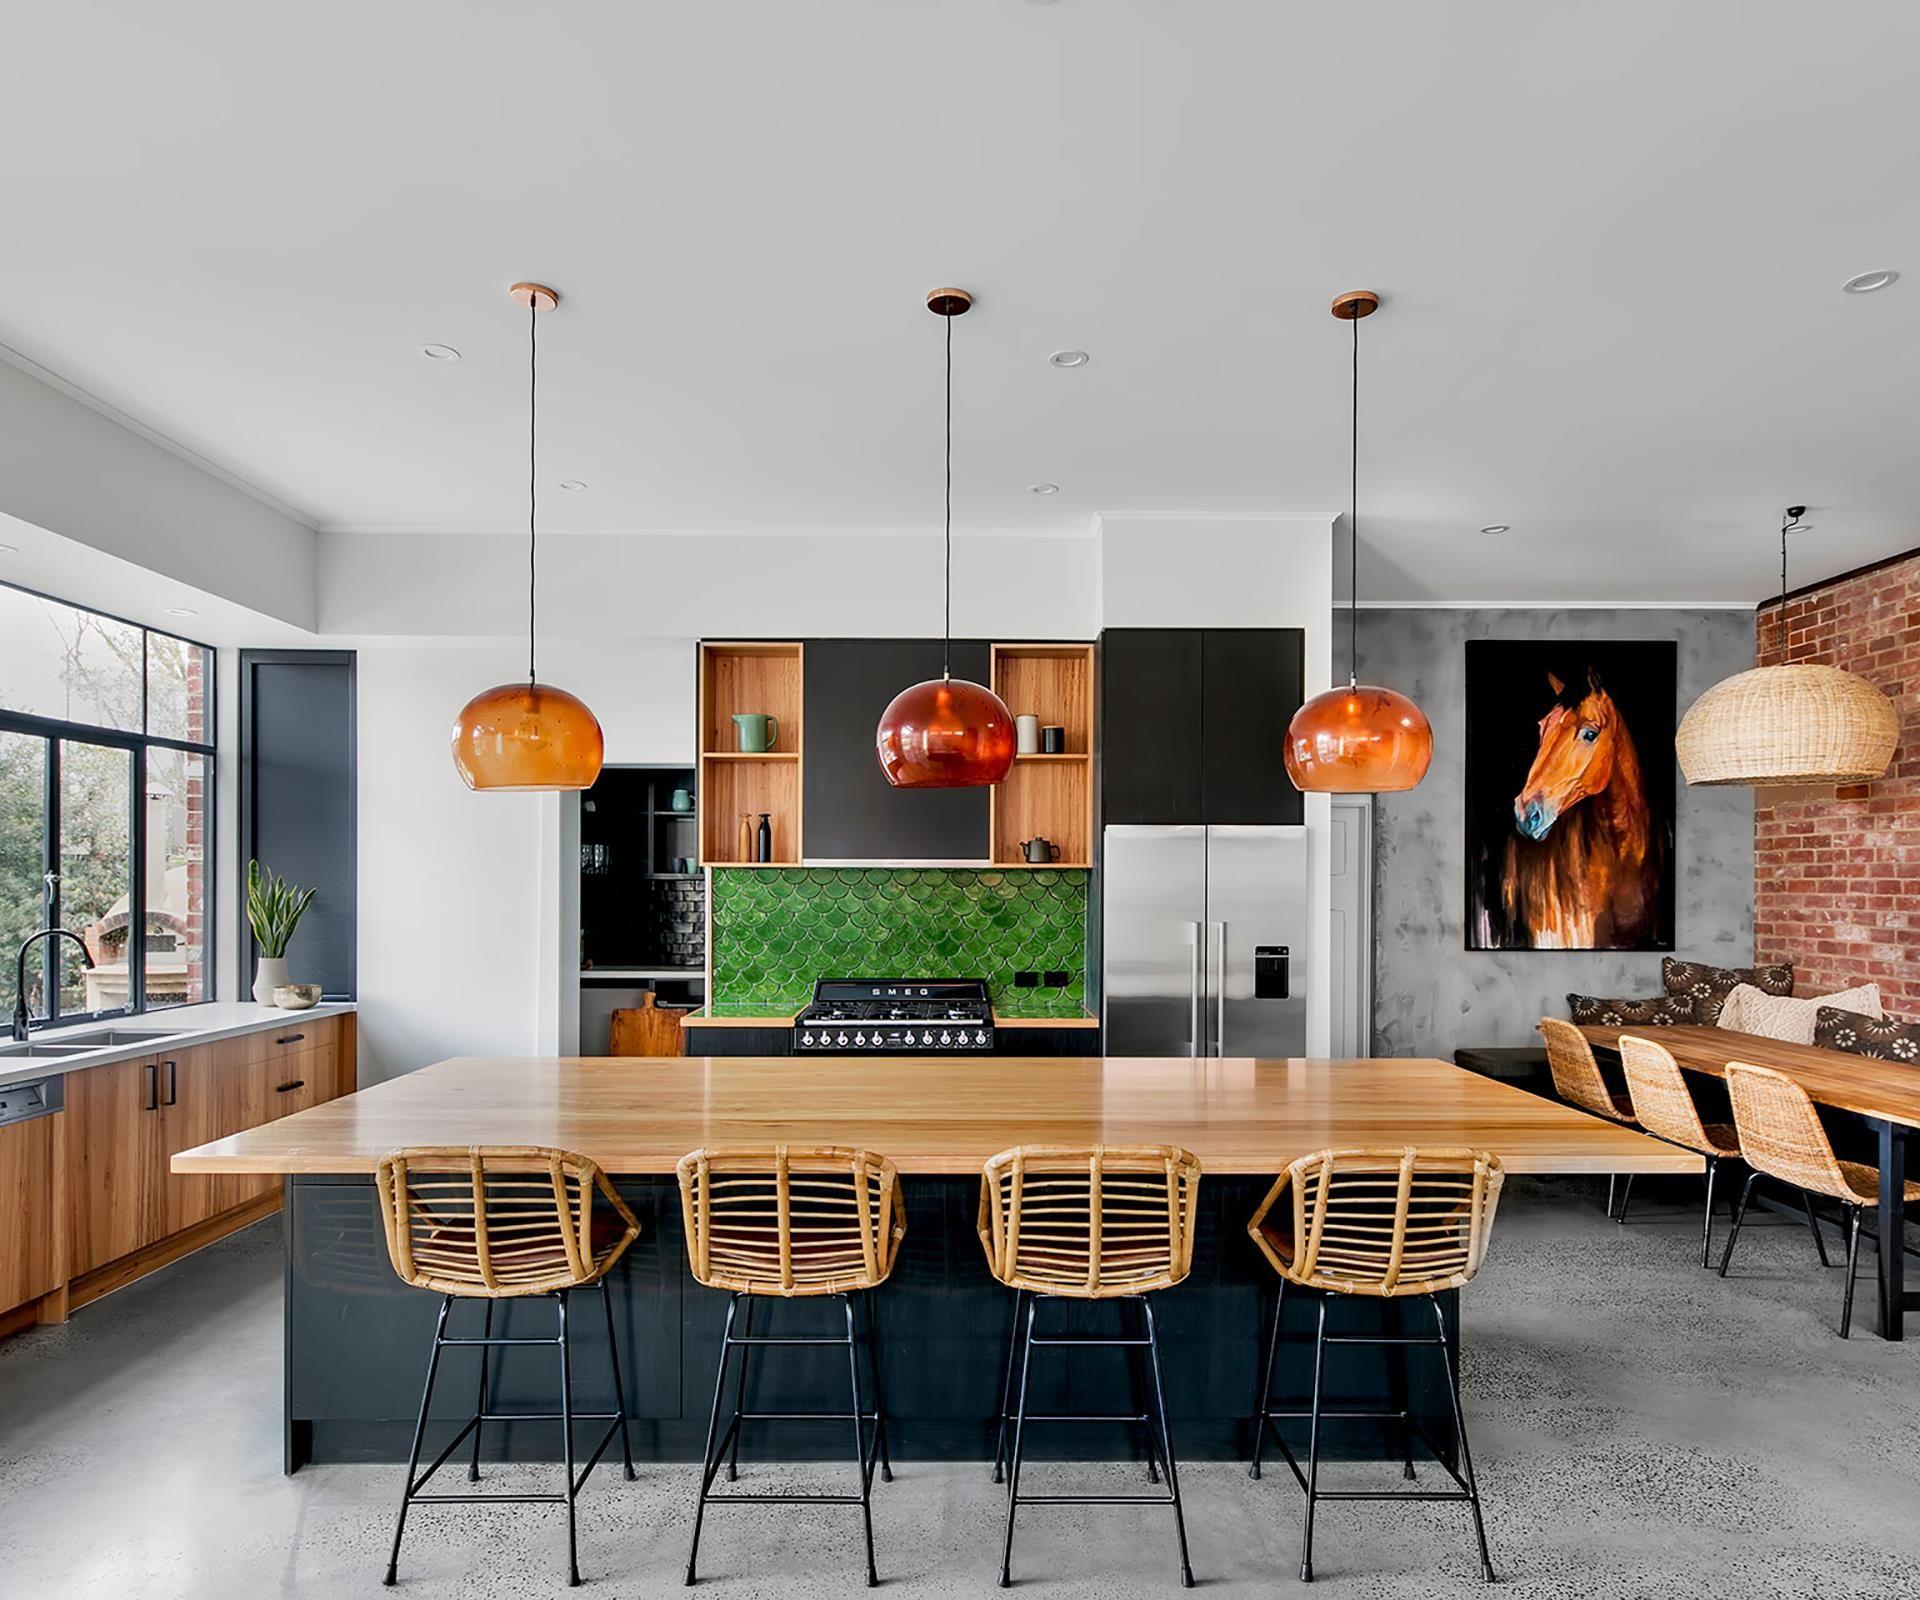 Home Design Ideas Australia: H&G Top 50 Rooms 2016: Kitchens & Bathrooms